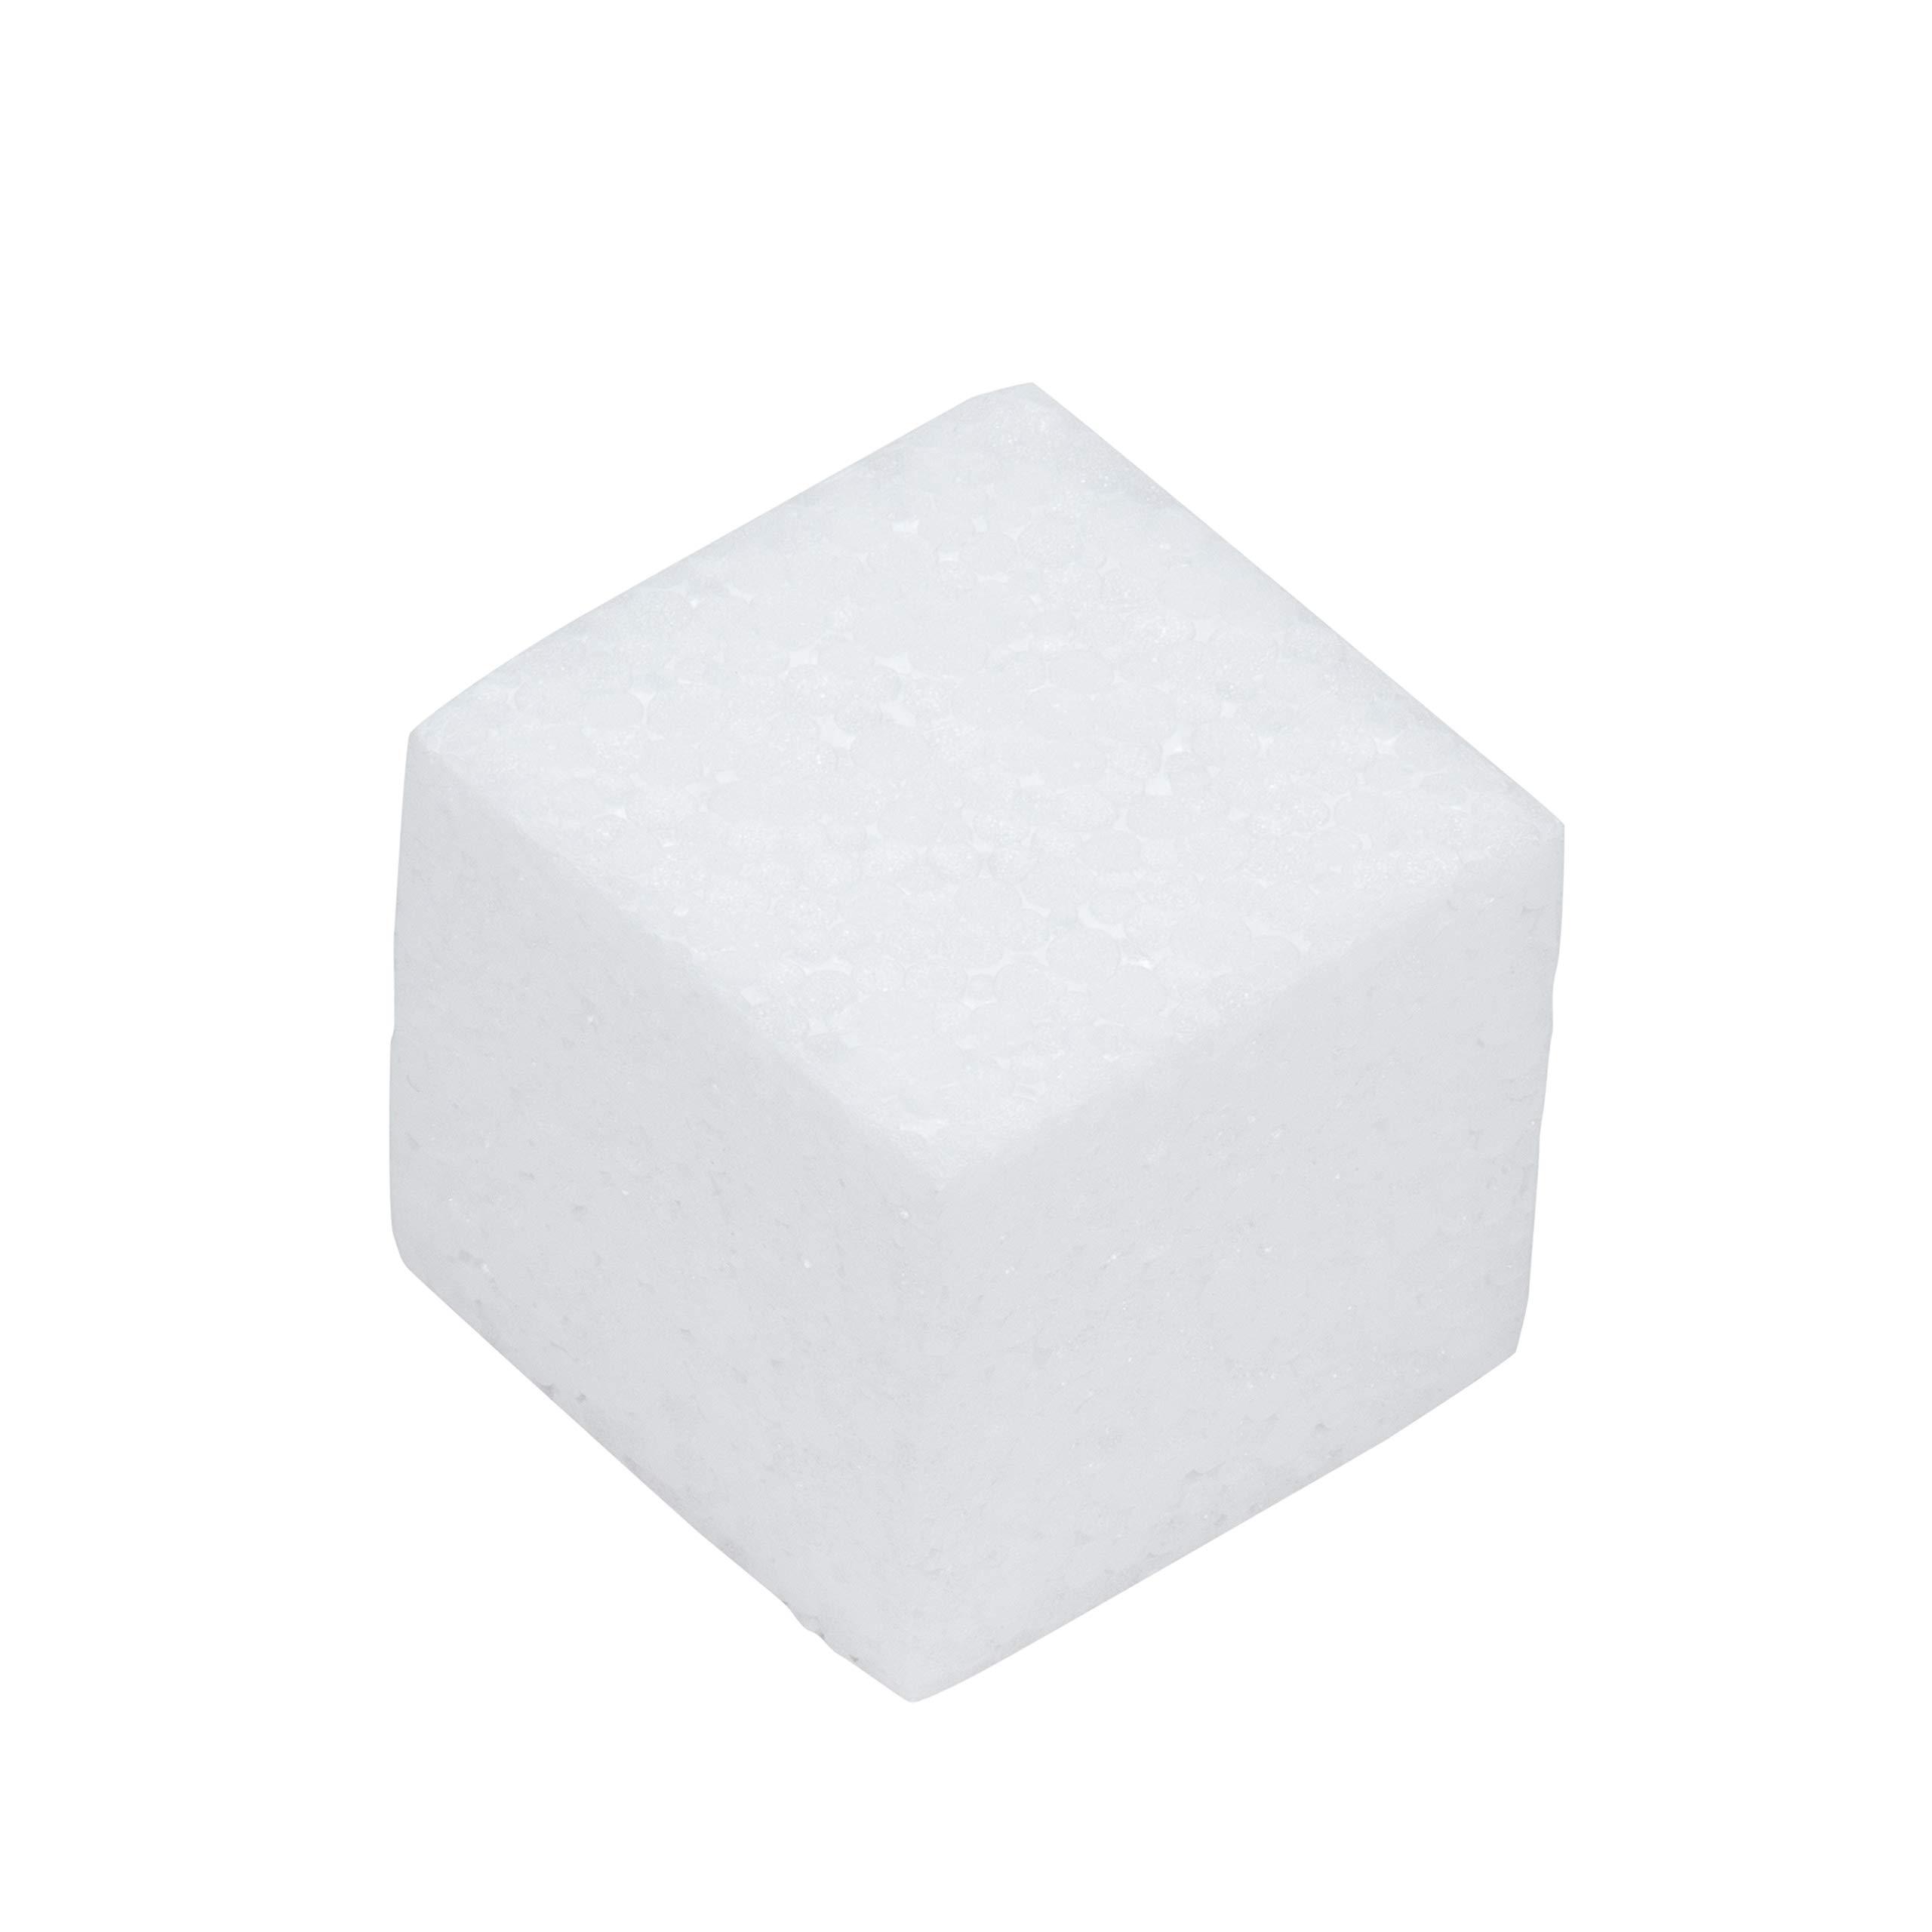 Craft Foam Blocks - 36-Piece Polystyrene Foam Blocks for Crafts and Modeling, 2 x 2 x 2 Inches Blank Craft Foam by Genie Crafts (Image #4)